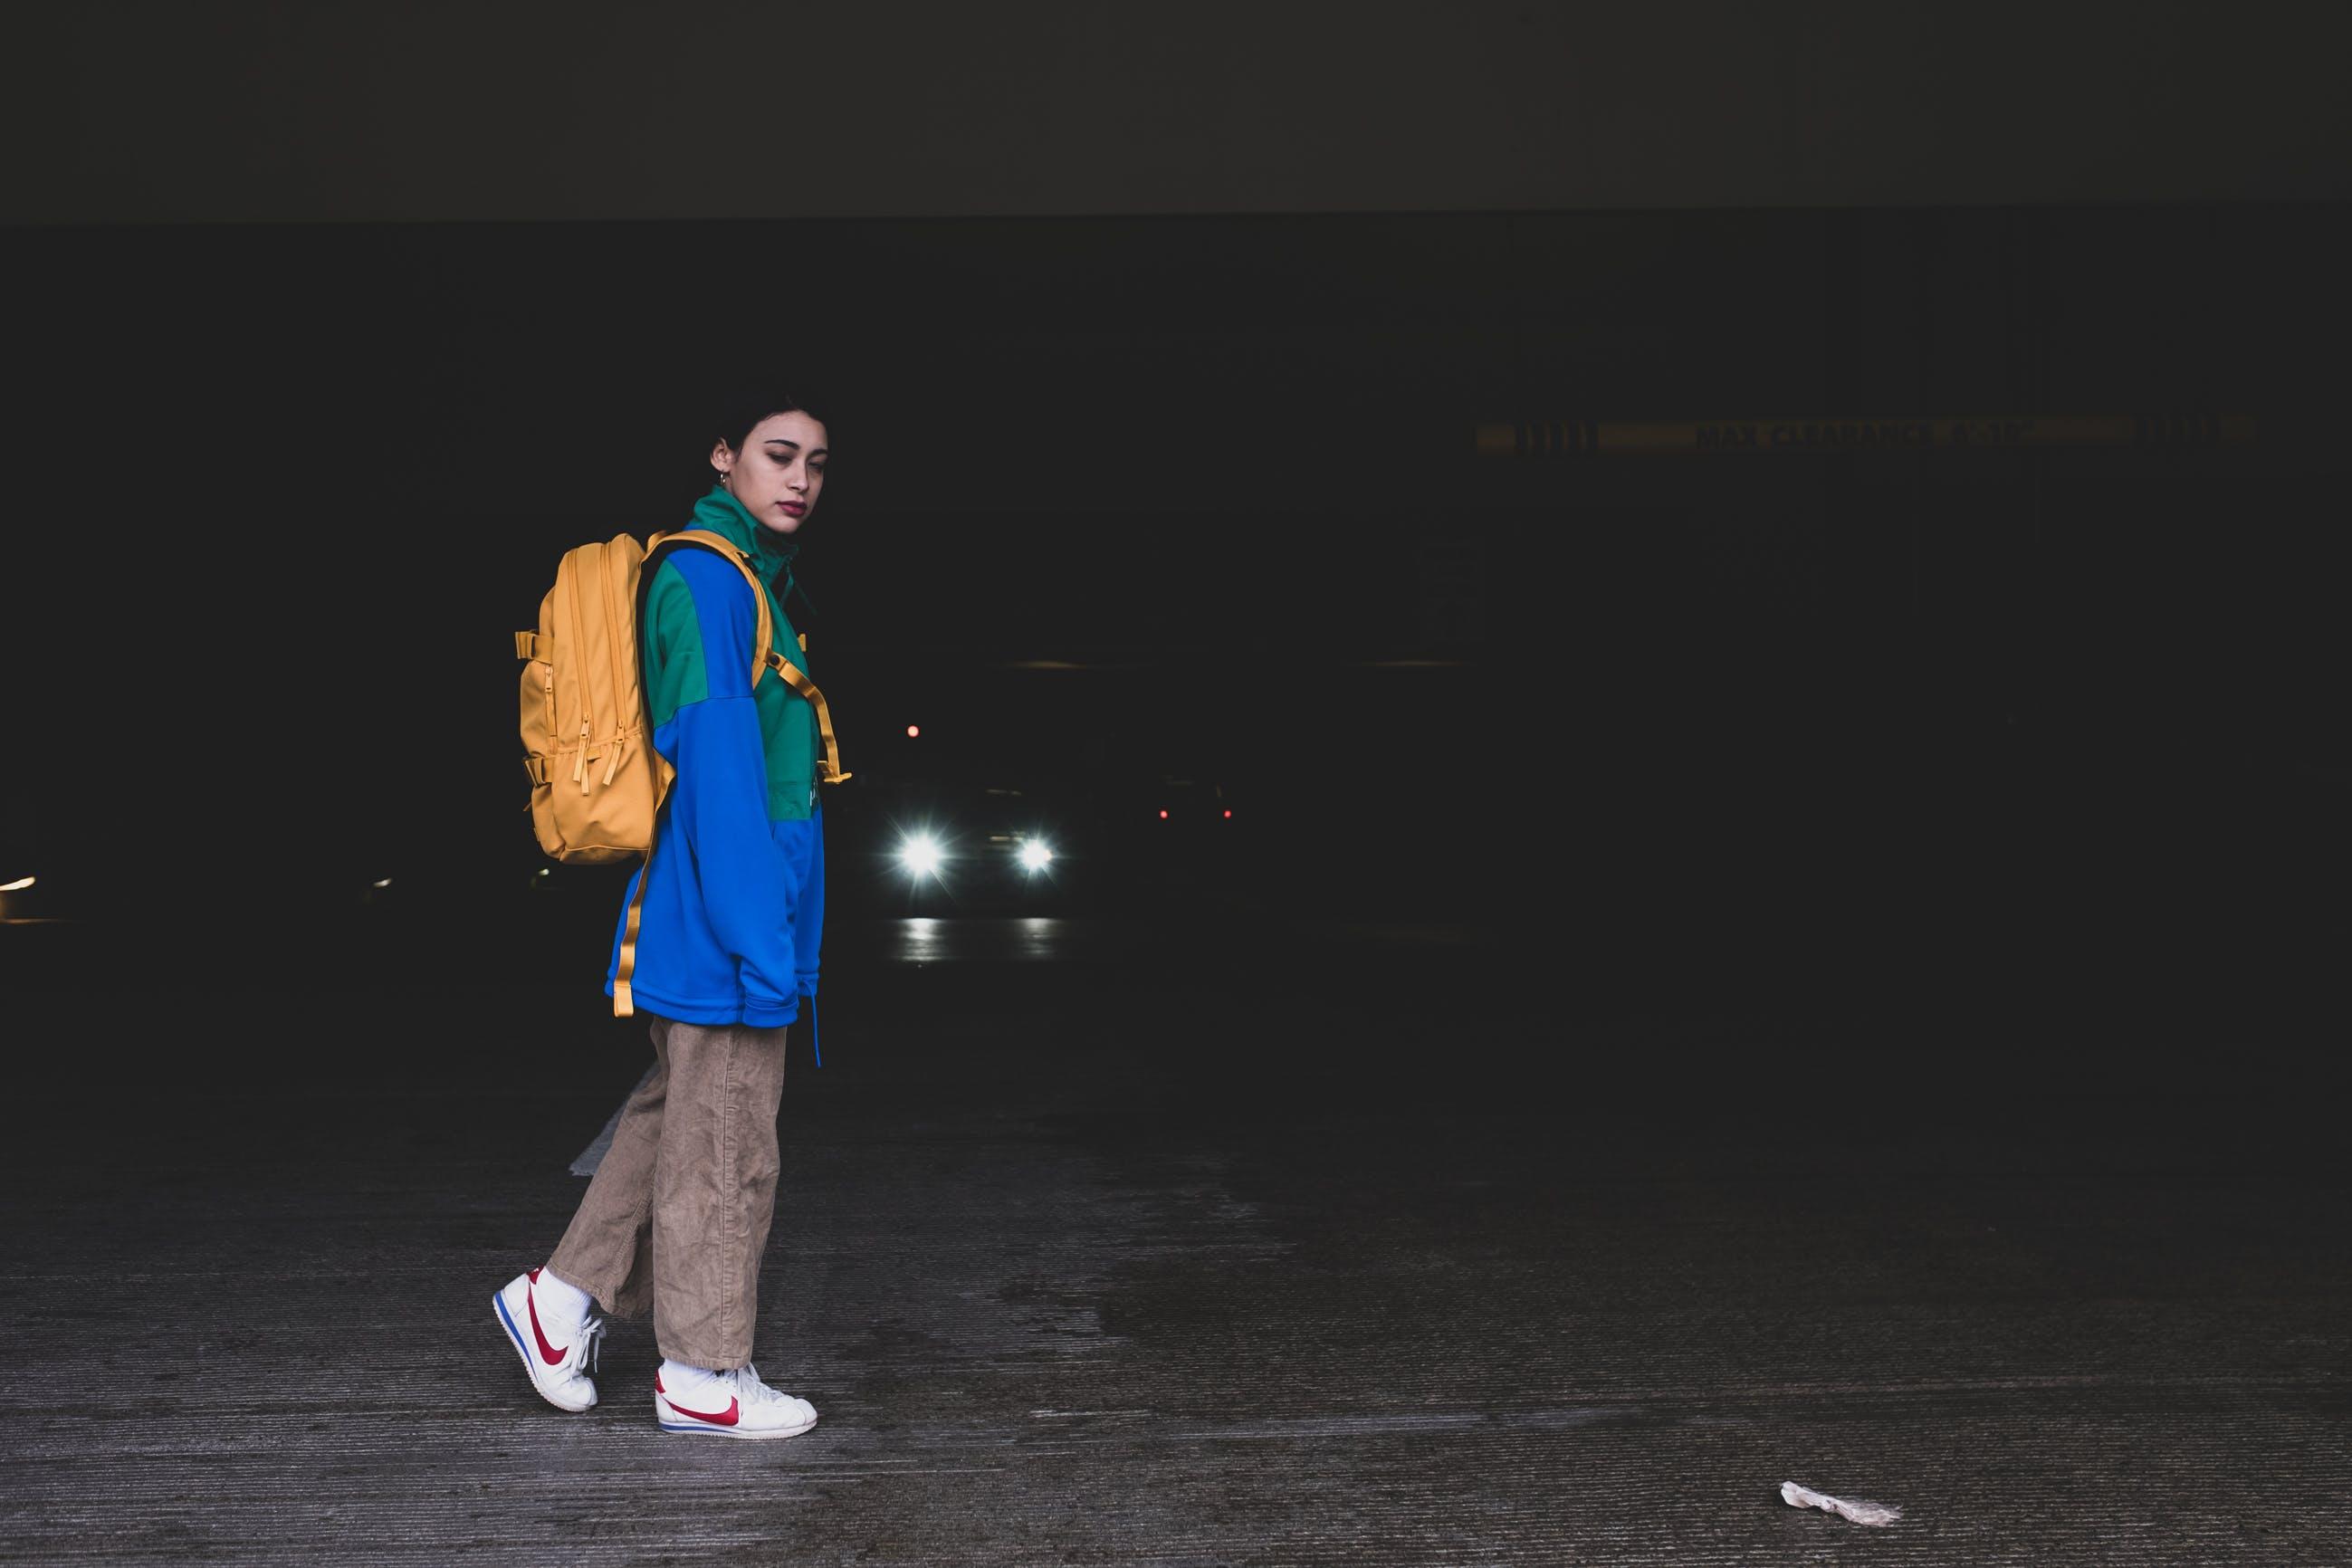 Woman Wearing Yellow Backpack